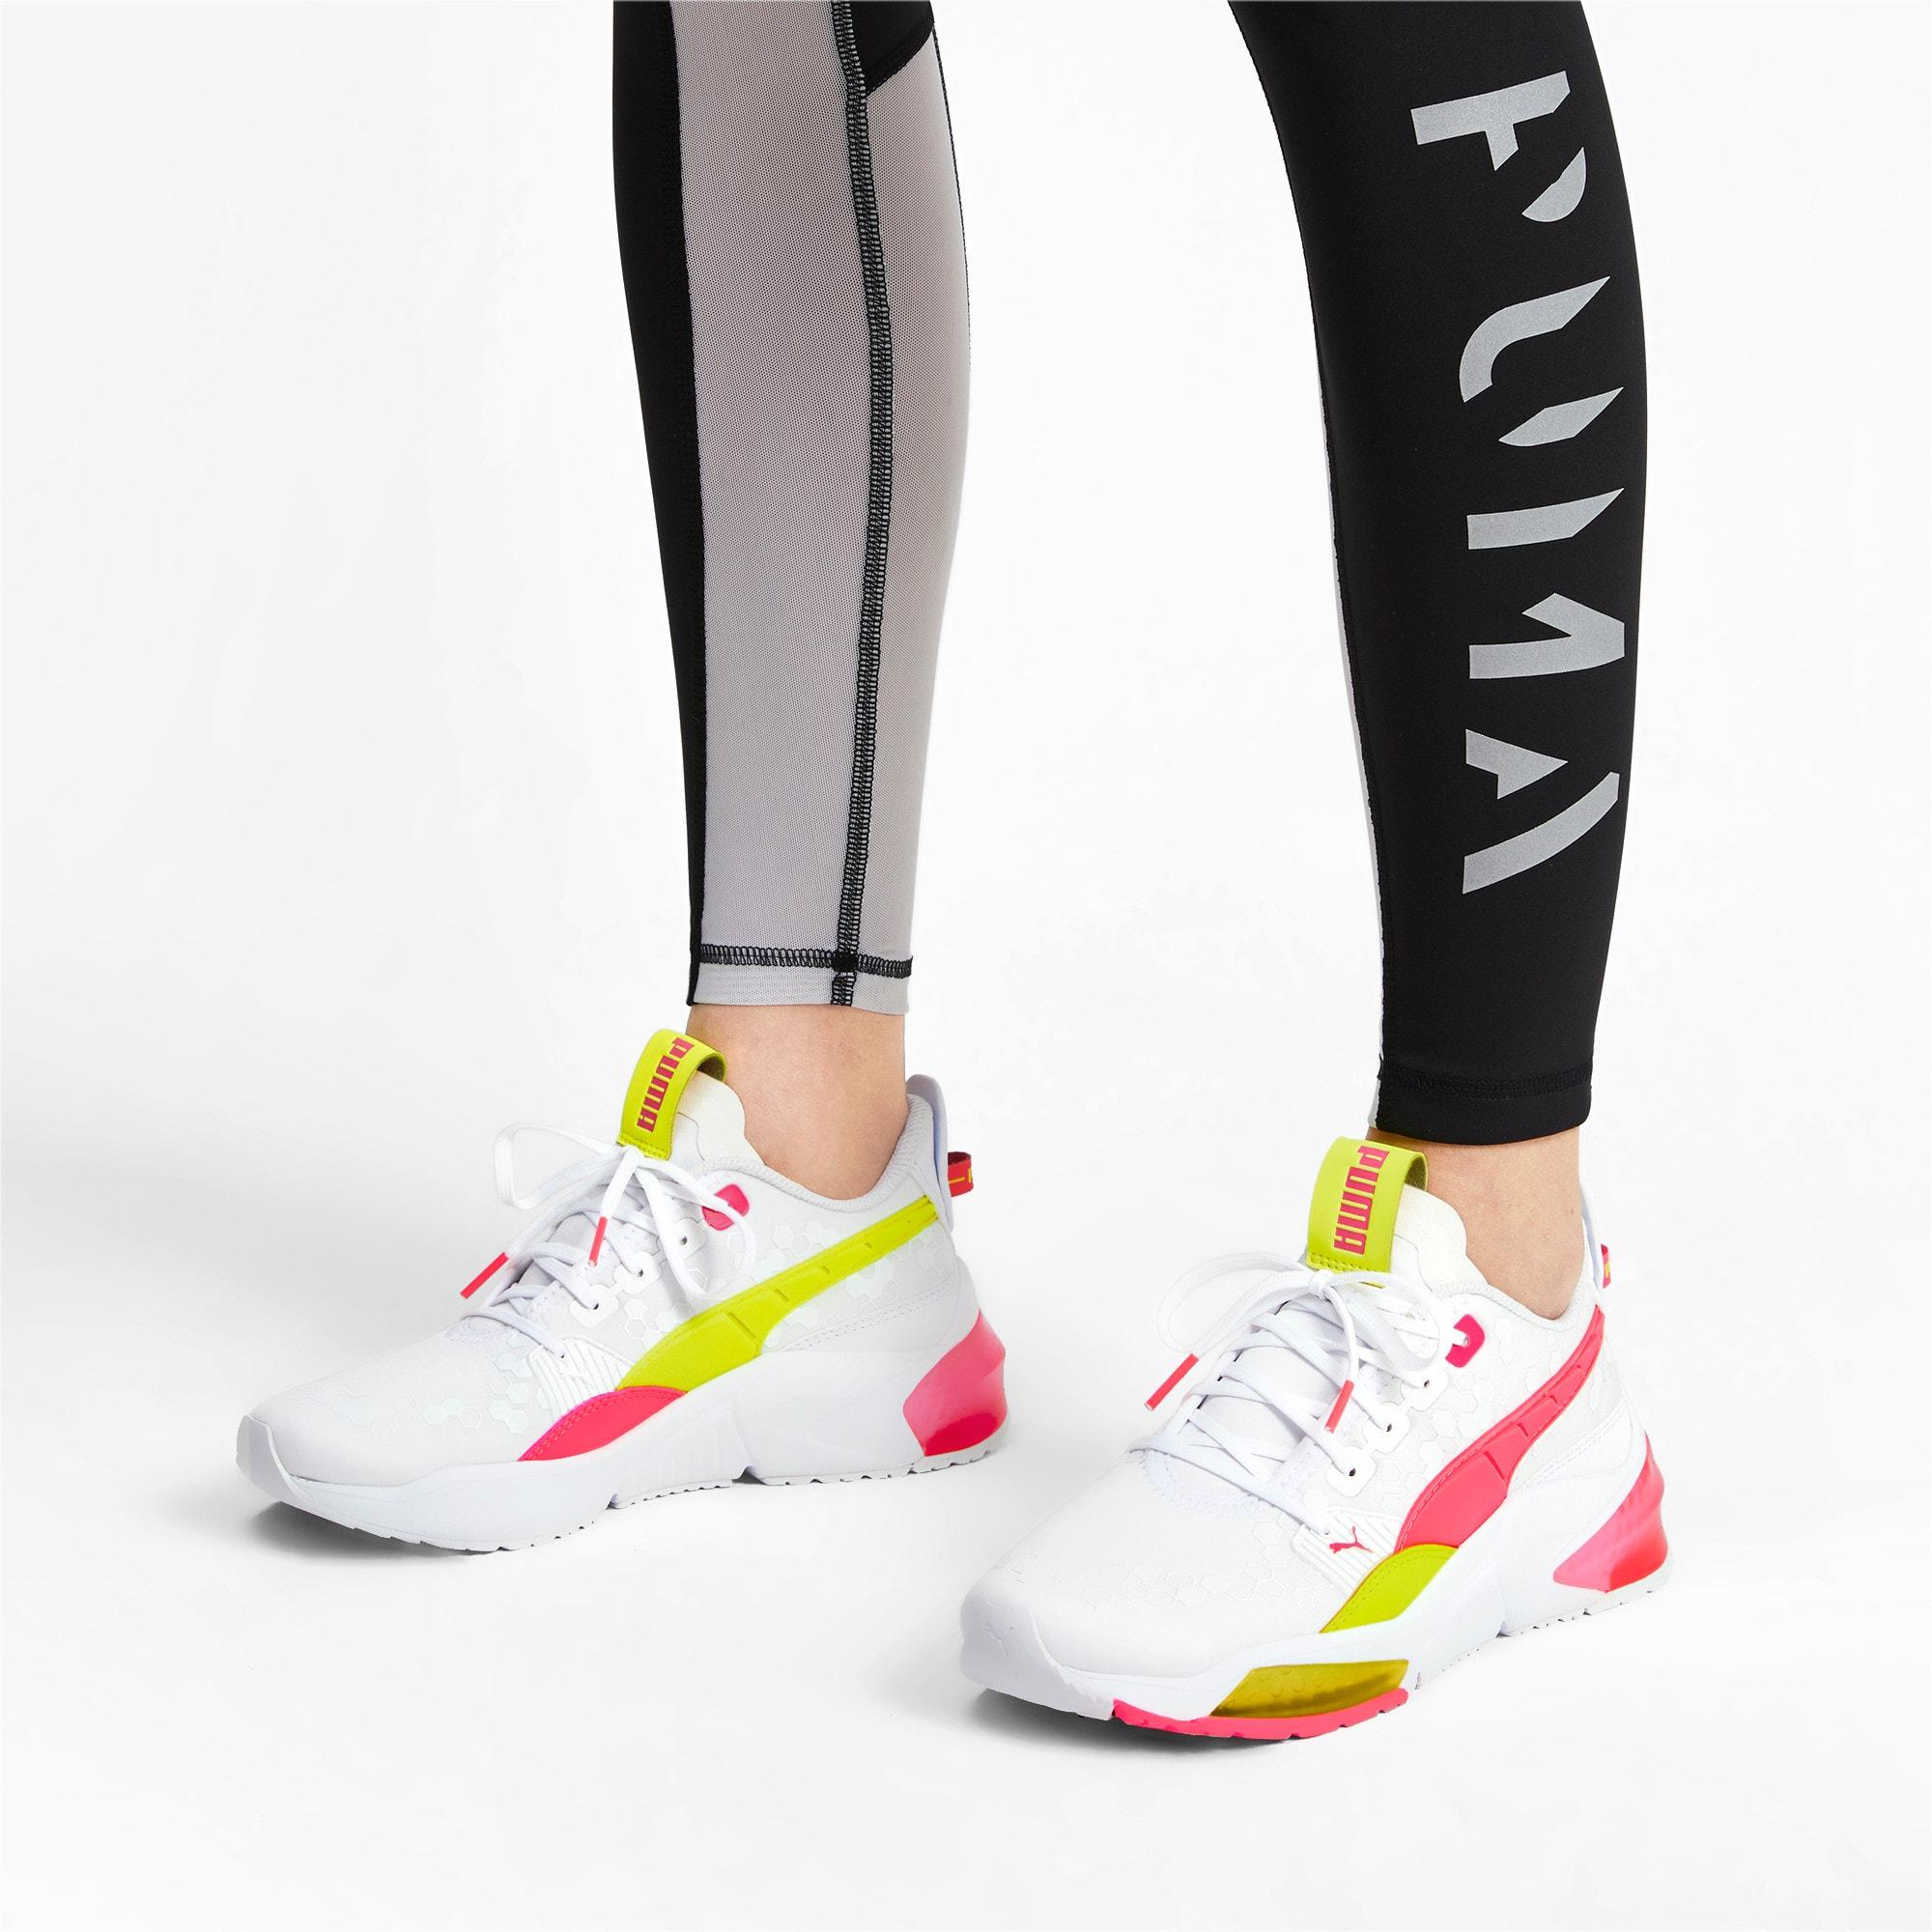 Thumbnail 2 of LQDCELL Optic Training Shoes, Puma White-Y Alert-Pin Alert, medium